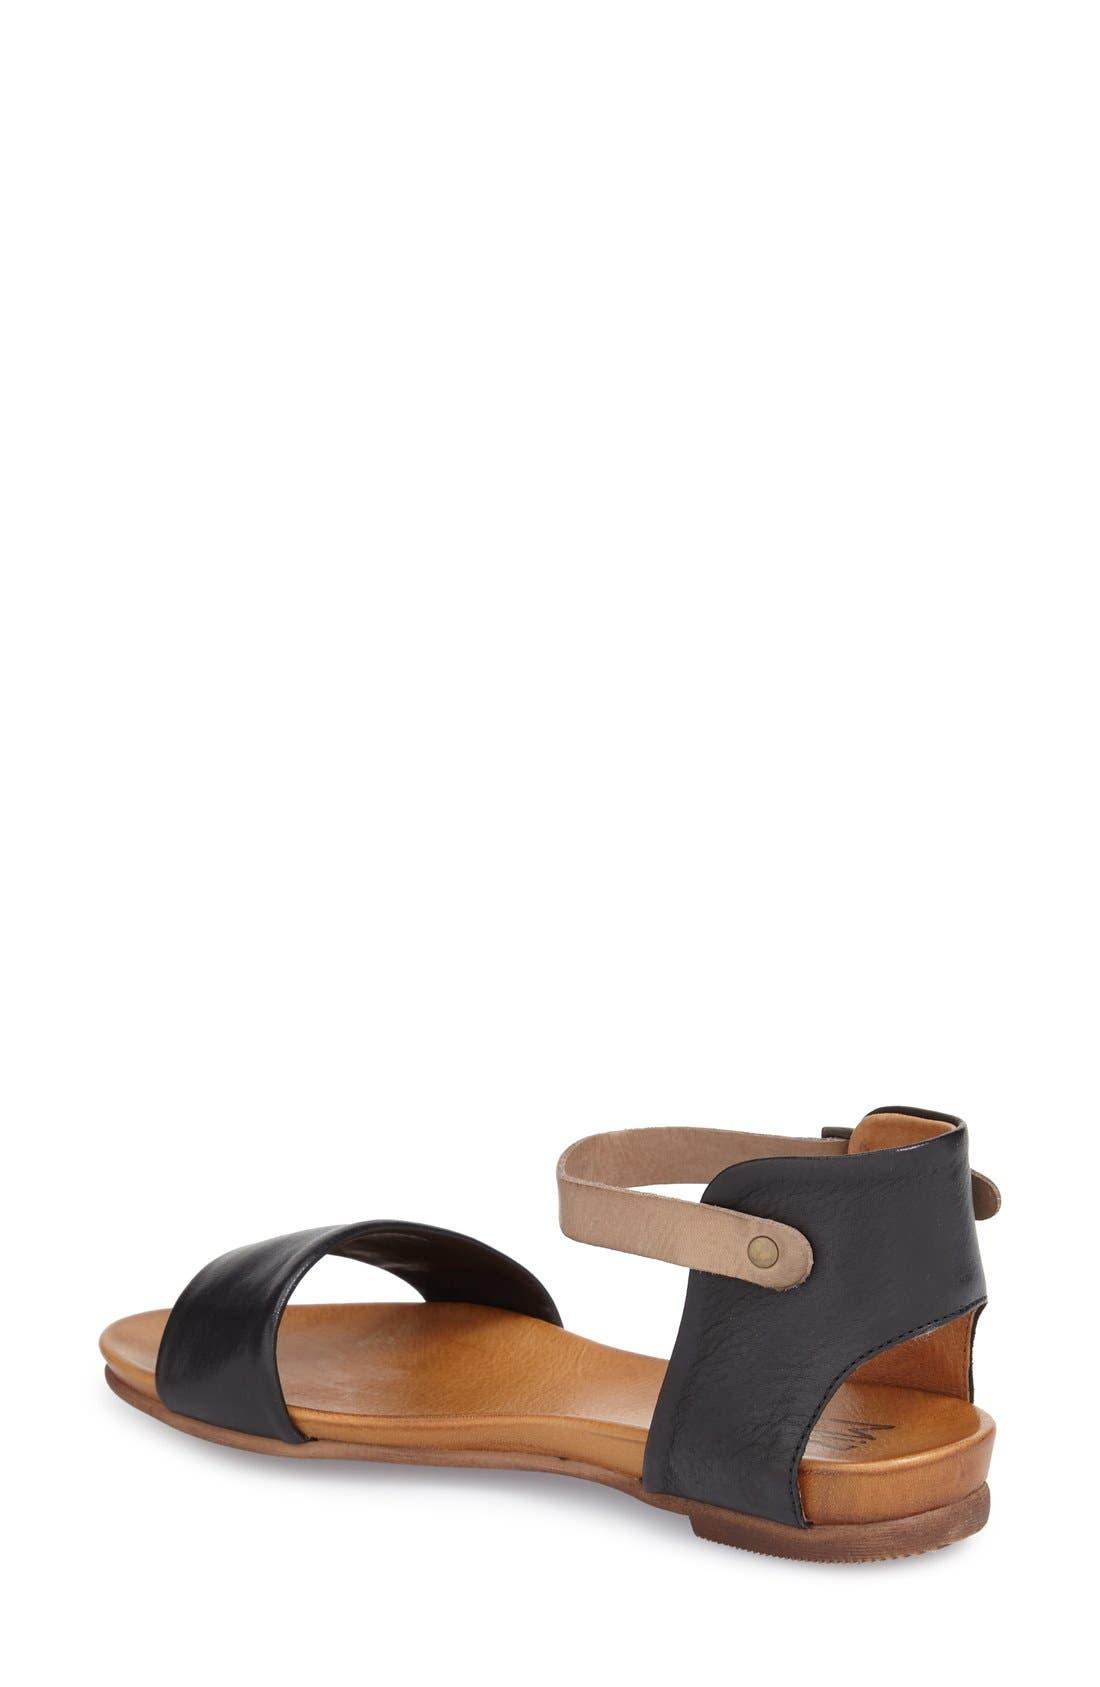 'Alanis' Sandal,                             Alternate thumbnail 2, color,                             Black Leather